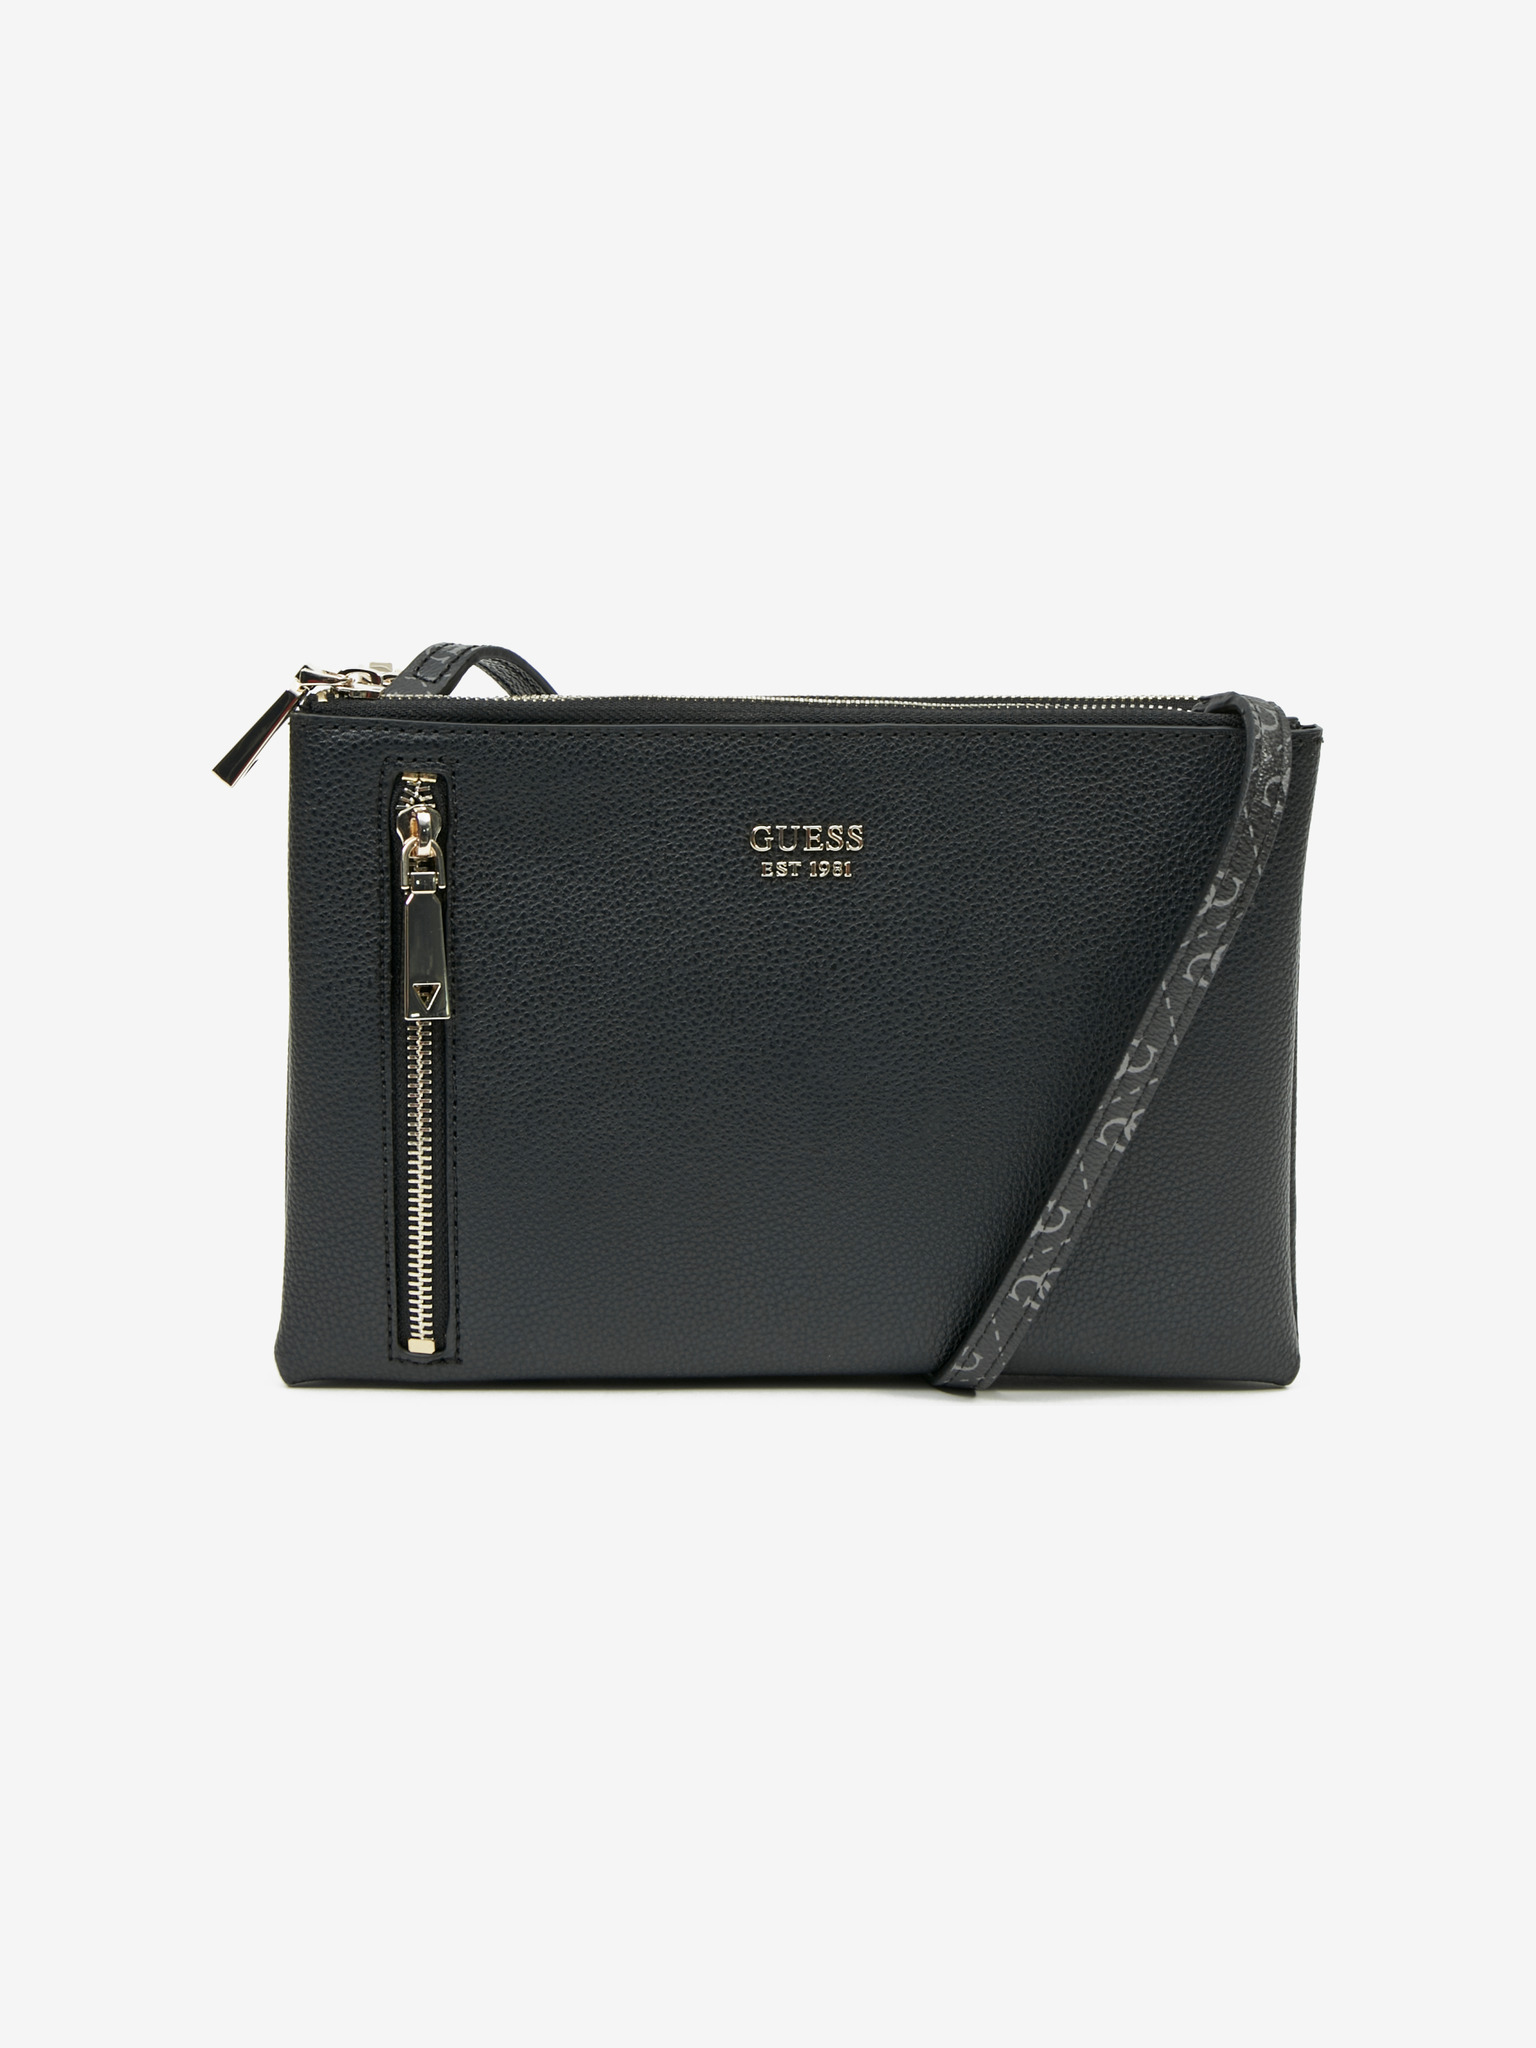 Guess black crossbody handbag Naya Double